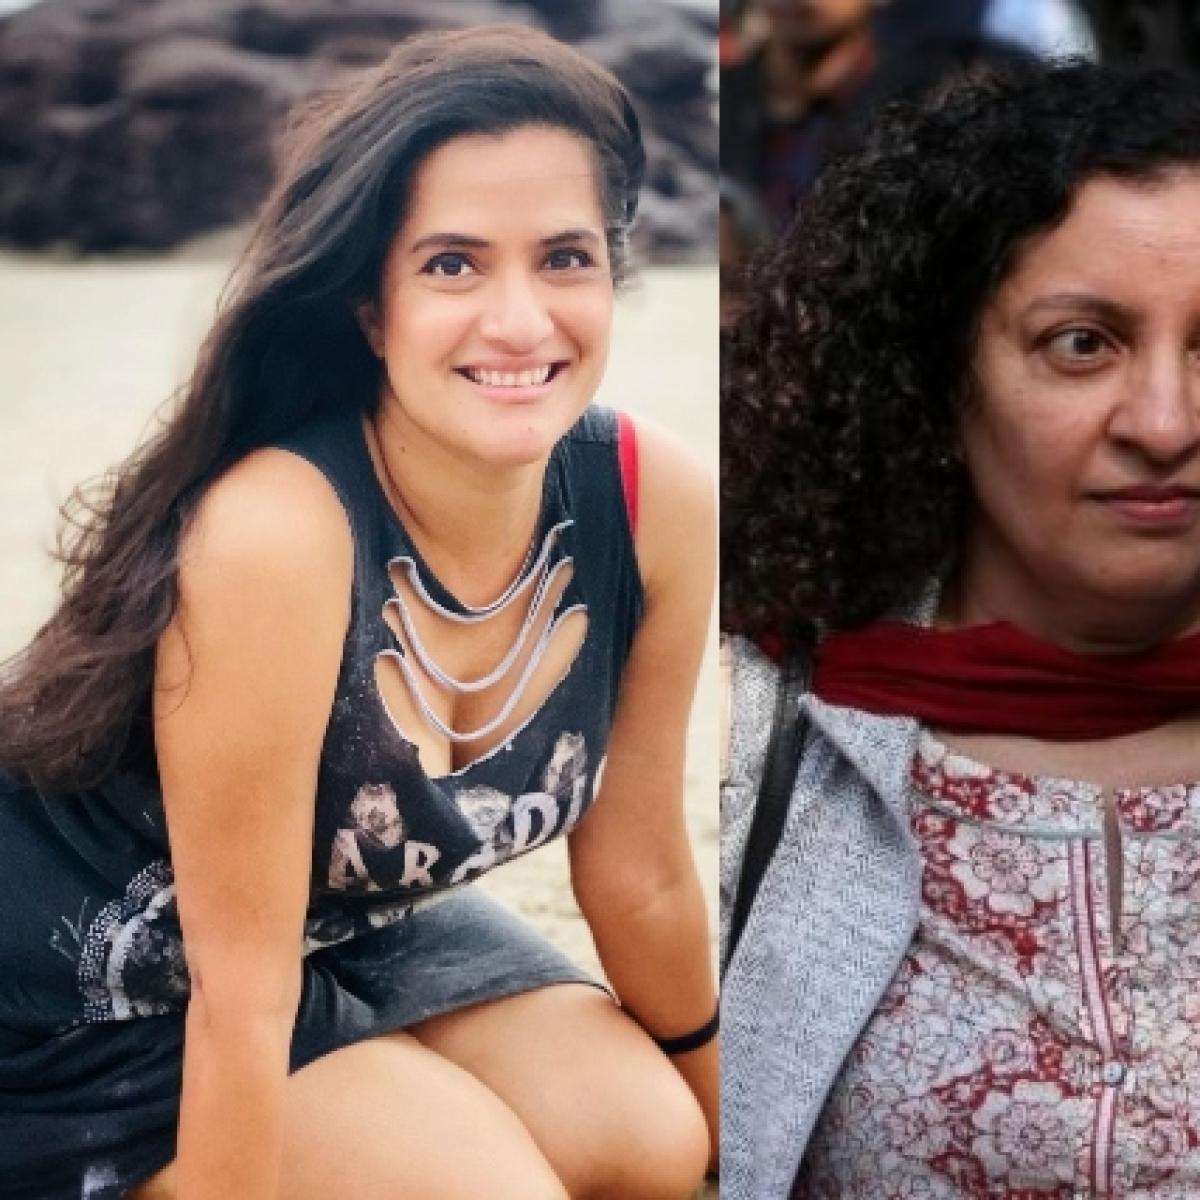 #MeToo: Sona Mohapatra, Swara Bhasker, others hail 'braveheart' Priya Ramani for taking on MJ Akbar in court